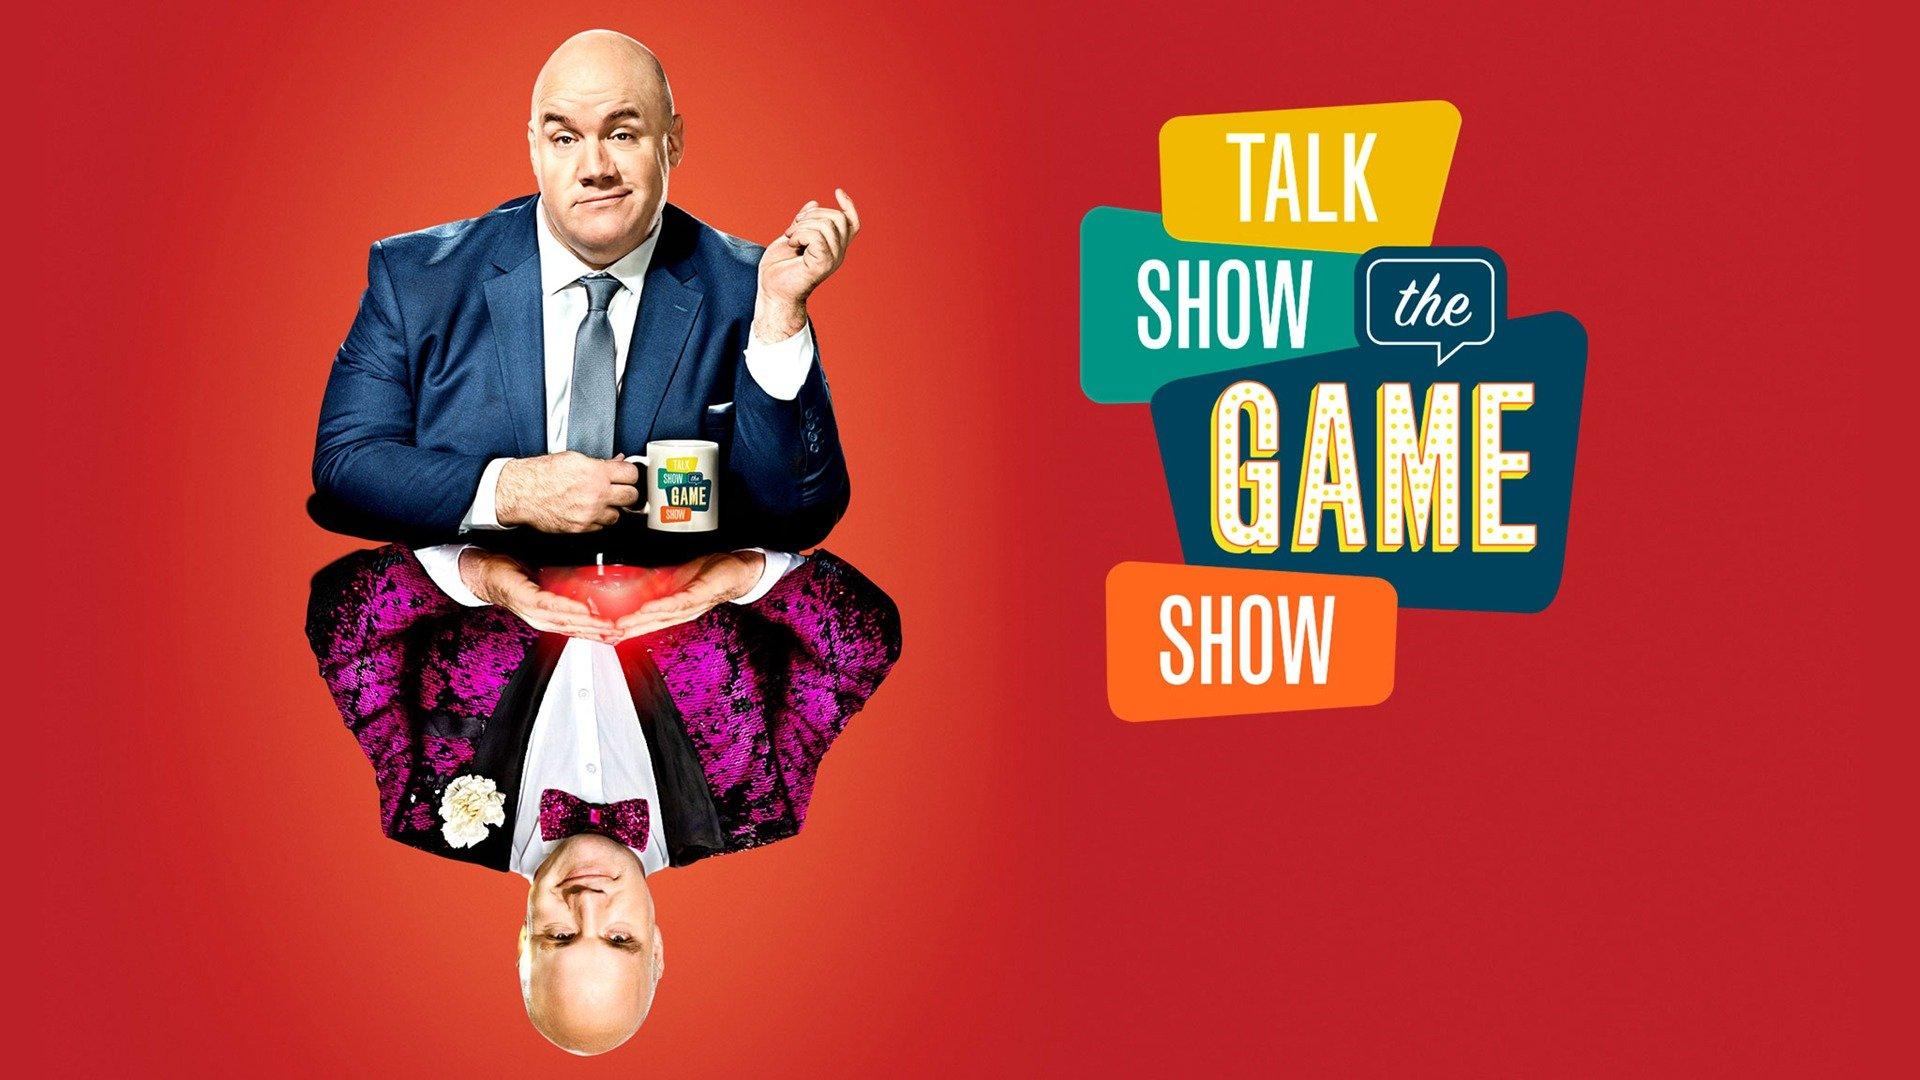 Talk Show the Game Show - truTV